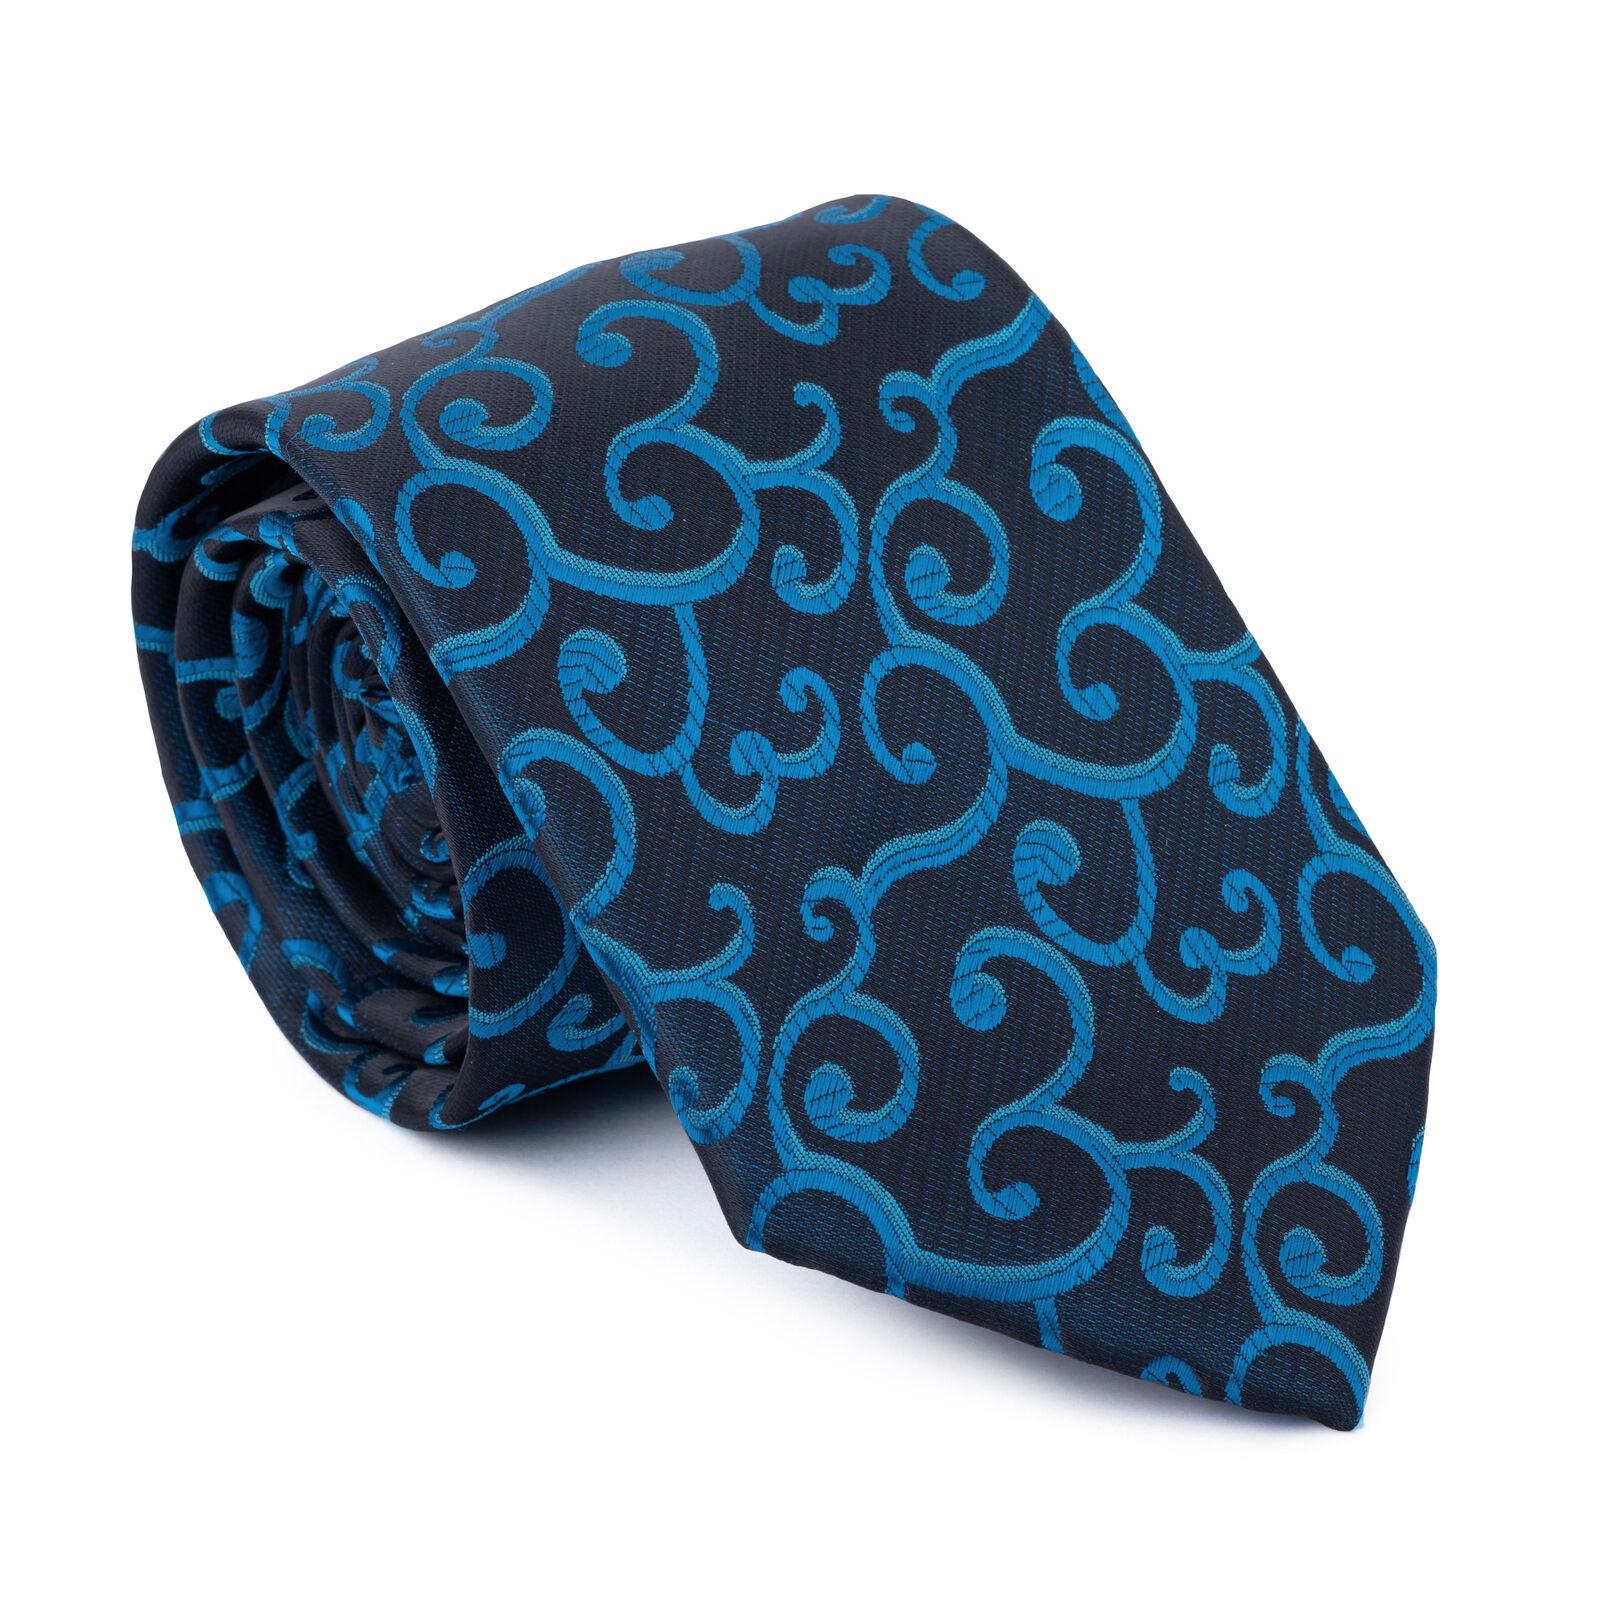 UK Teal on Black Tie Royal Swirl Regular Formal Wedding Necktie Multiple Colour